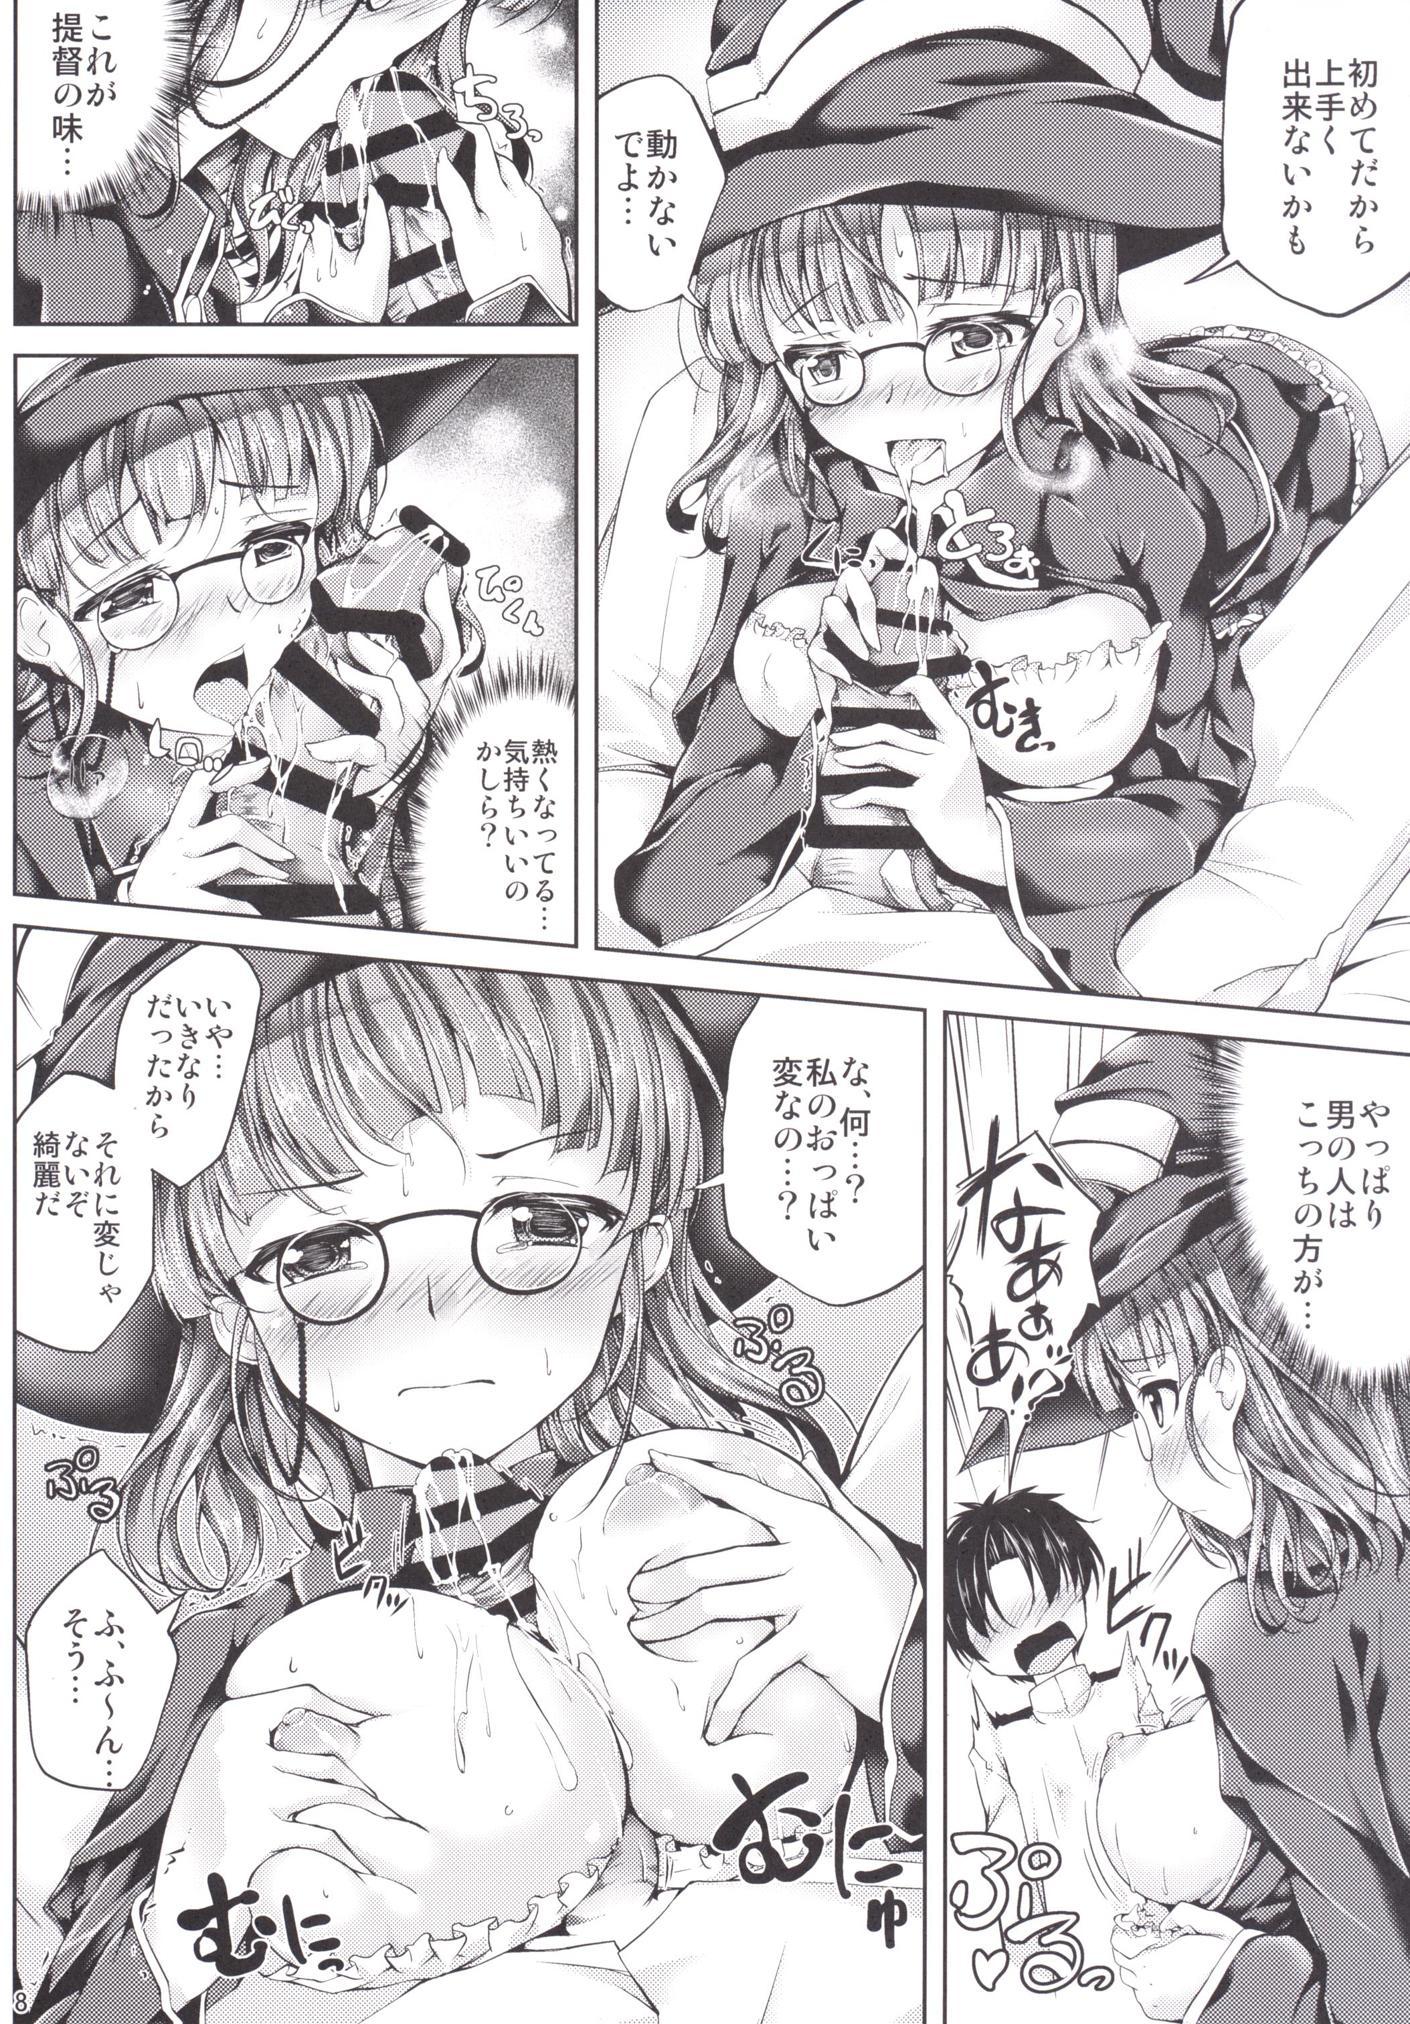 Koiiro Moyou 15 6